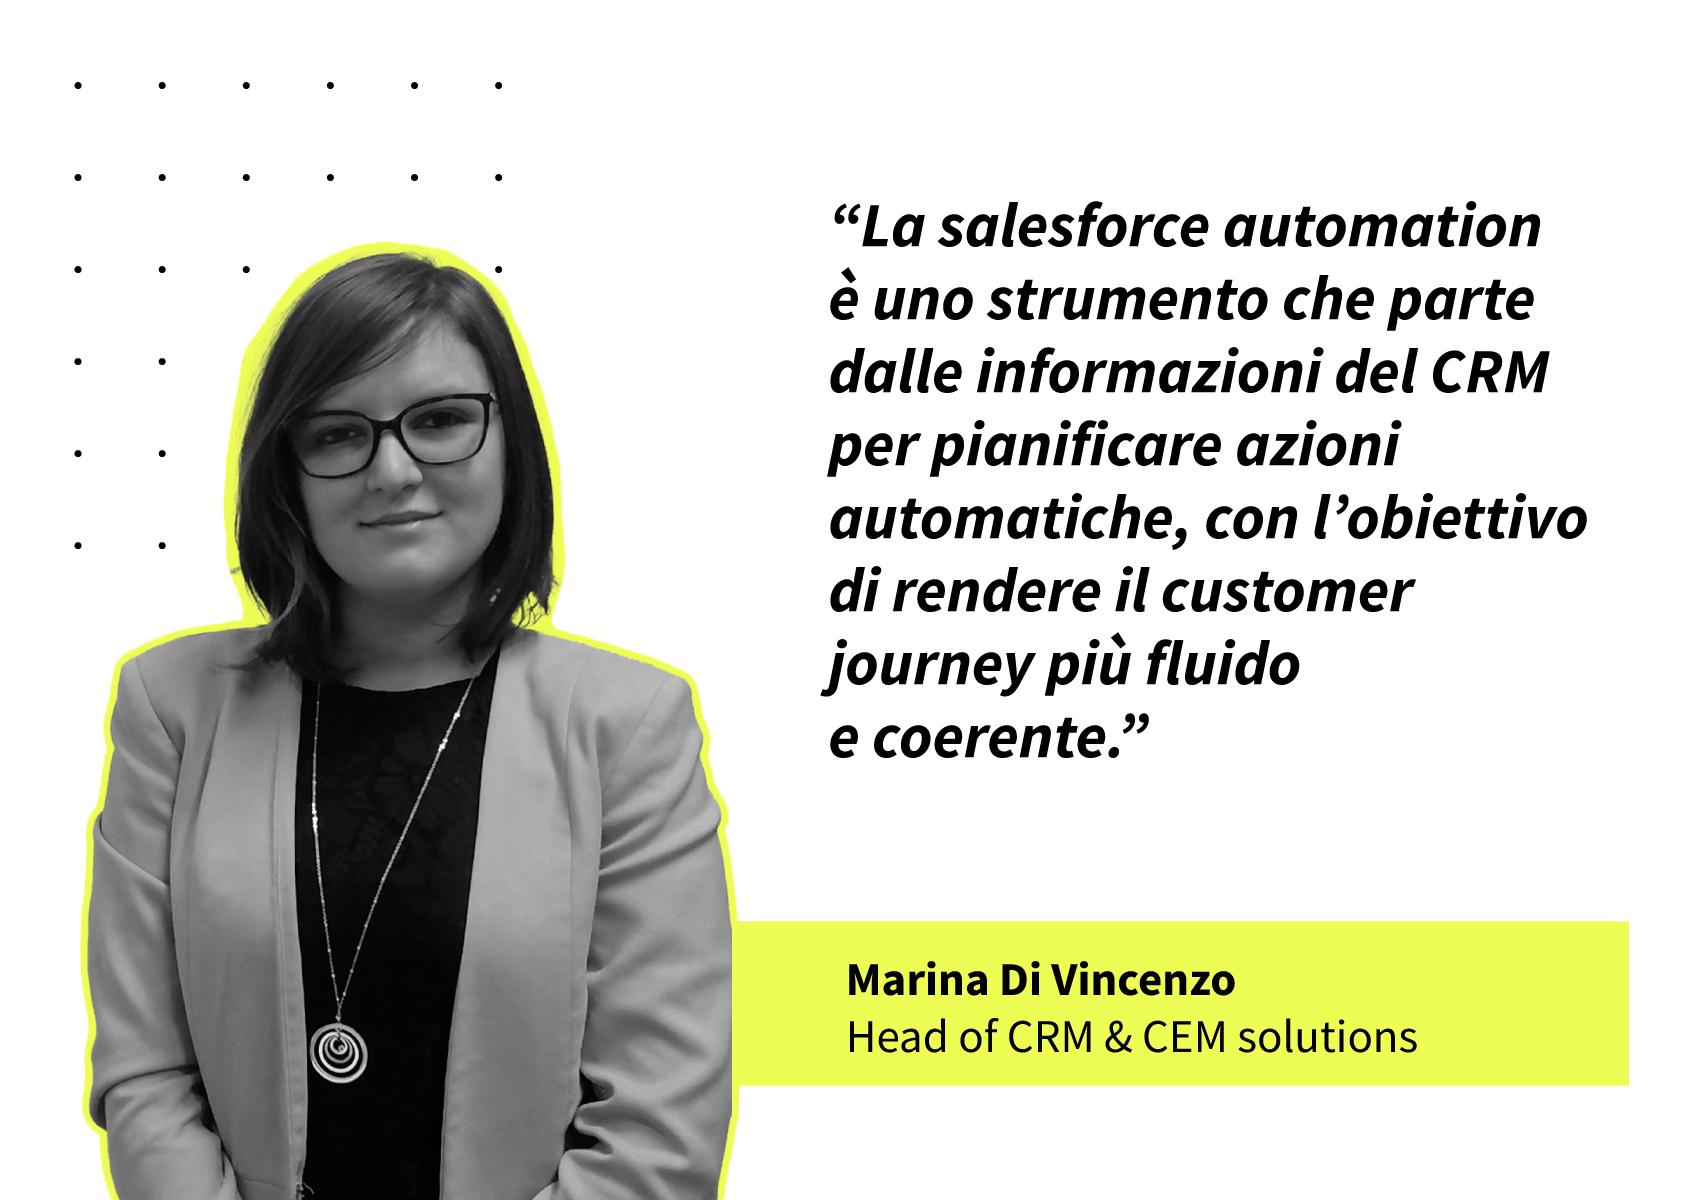 [AML]-salesforce-automation-citazione-Marina